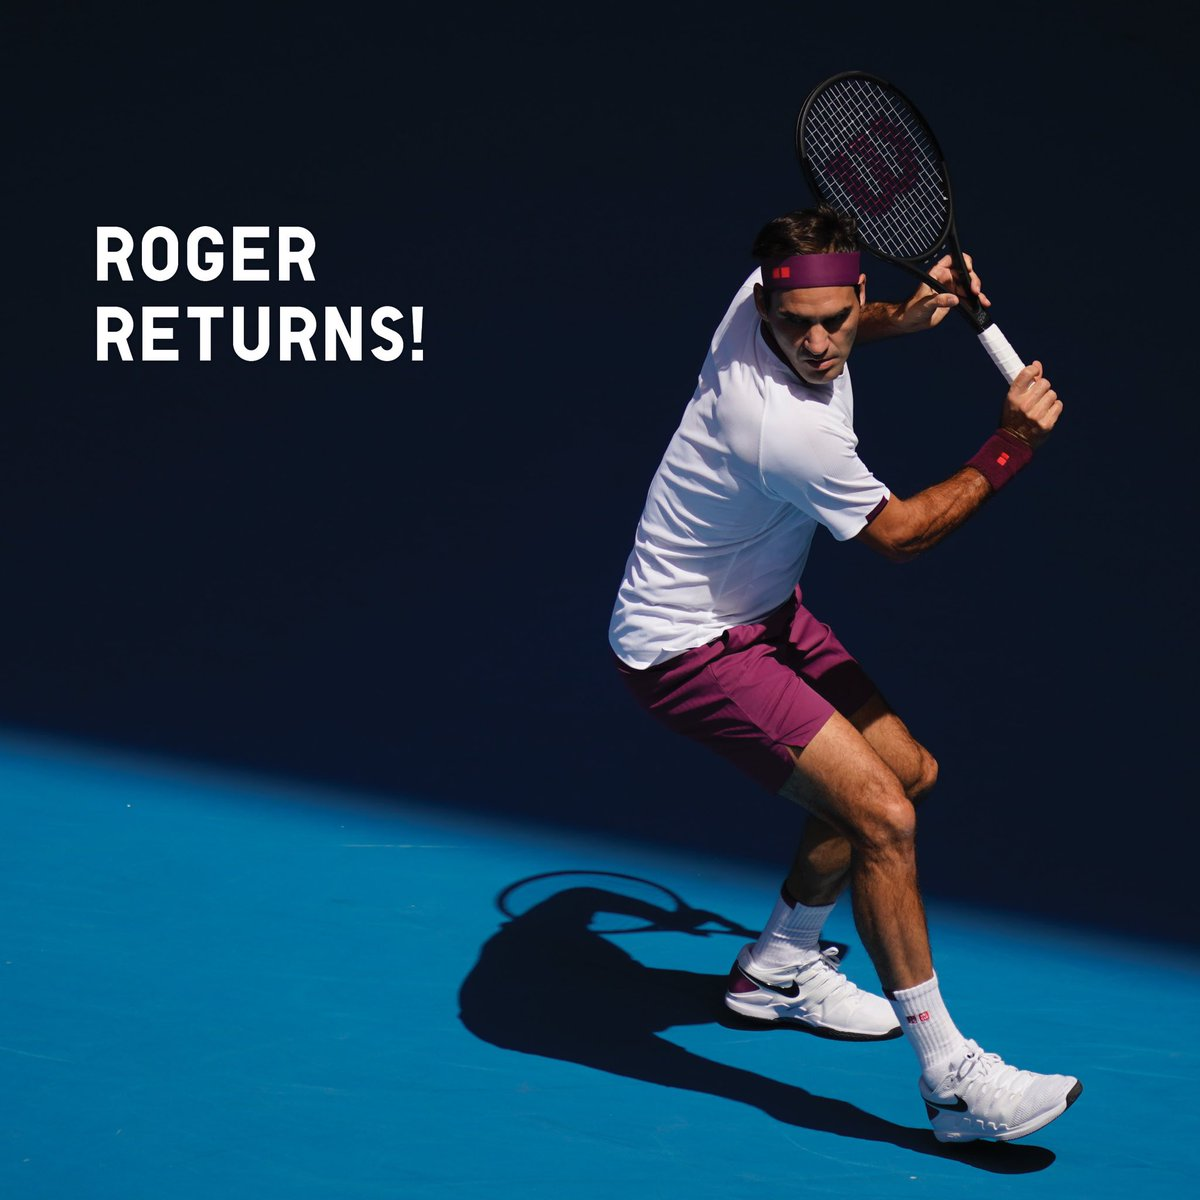 test ツイッターメディア - Help us celebrate his return to world competition. It's always exciting when Roger is in the game!  3月8日から始まるカタールでの大会で、フェデラー選手がいよいよ復帰! フェデラー選手の復帰を心から待ち望んでいたファンの皆さん、一緒に応援しましょう🎾✨  #RogerReturns https://t.co/ybG53dJKg0